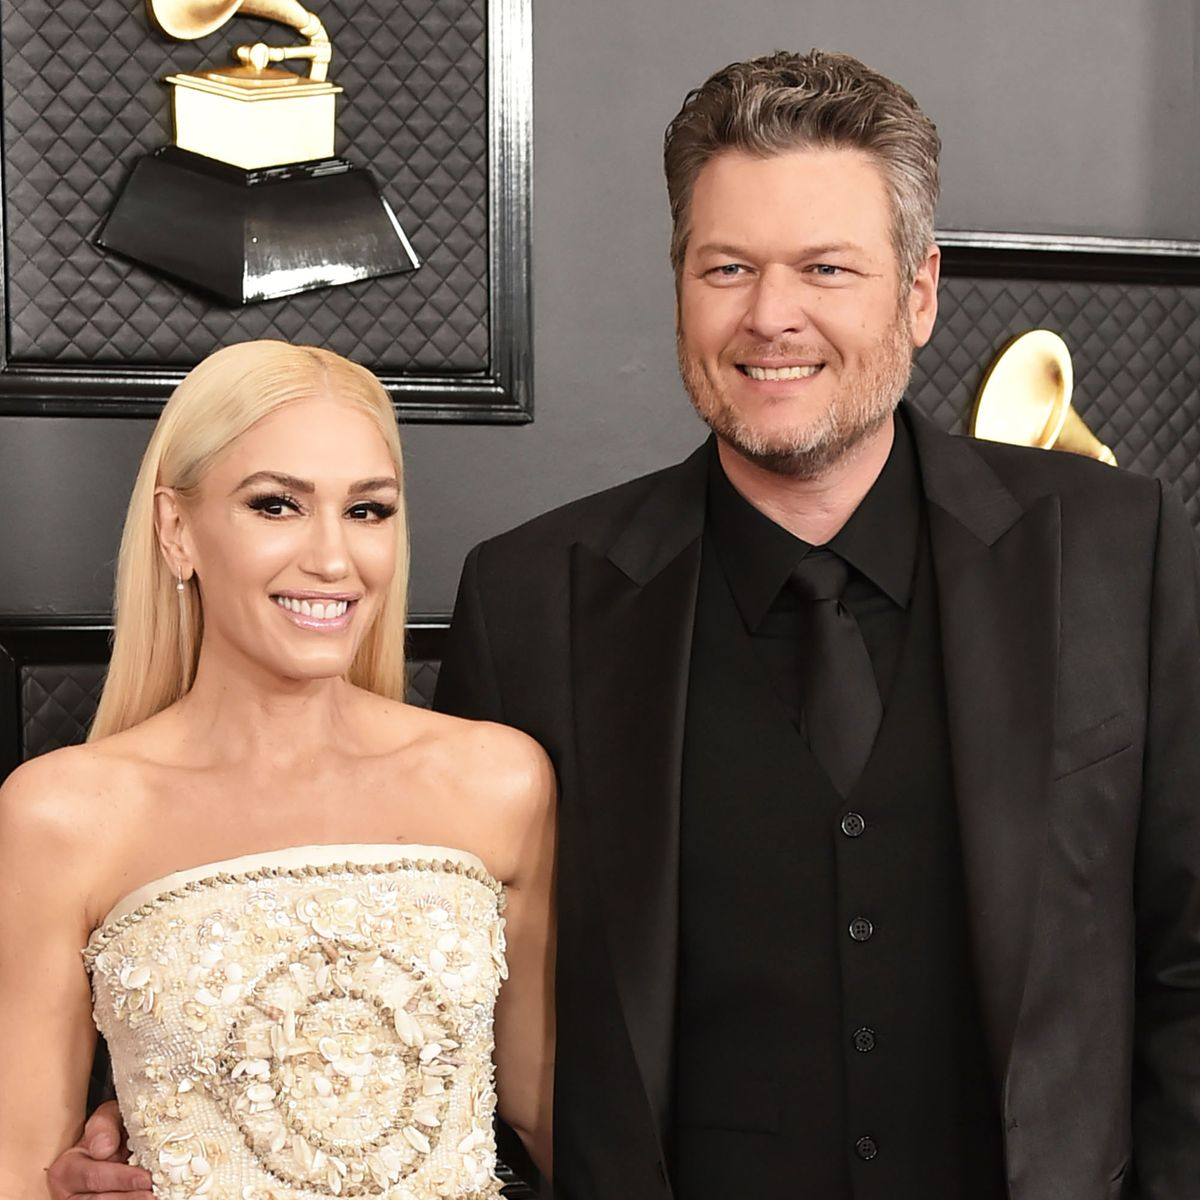 Gwen Stefani's latest details to marry Blake Shelton